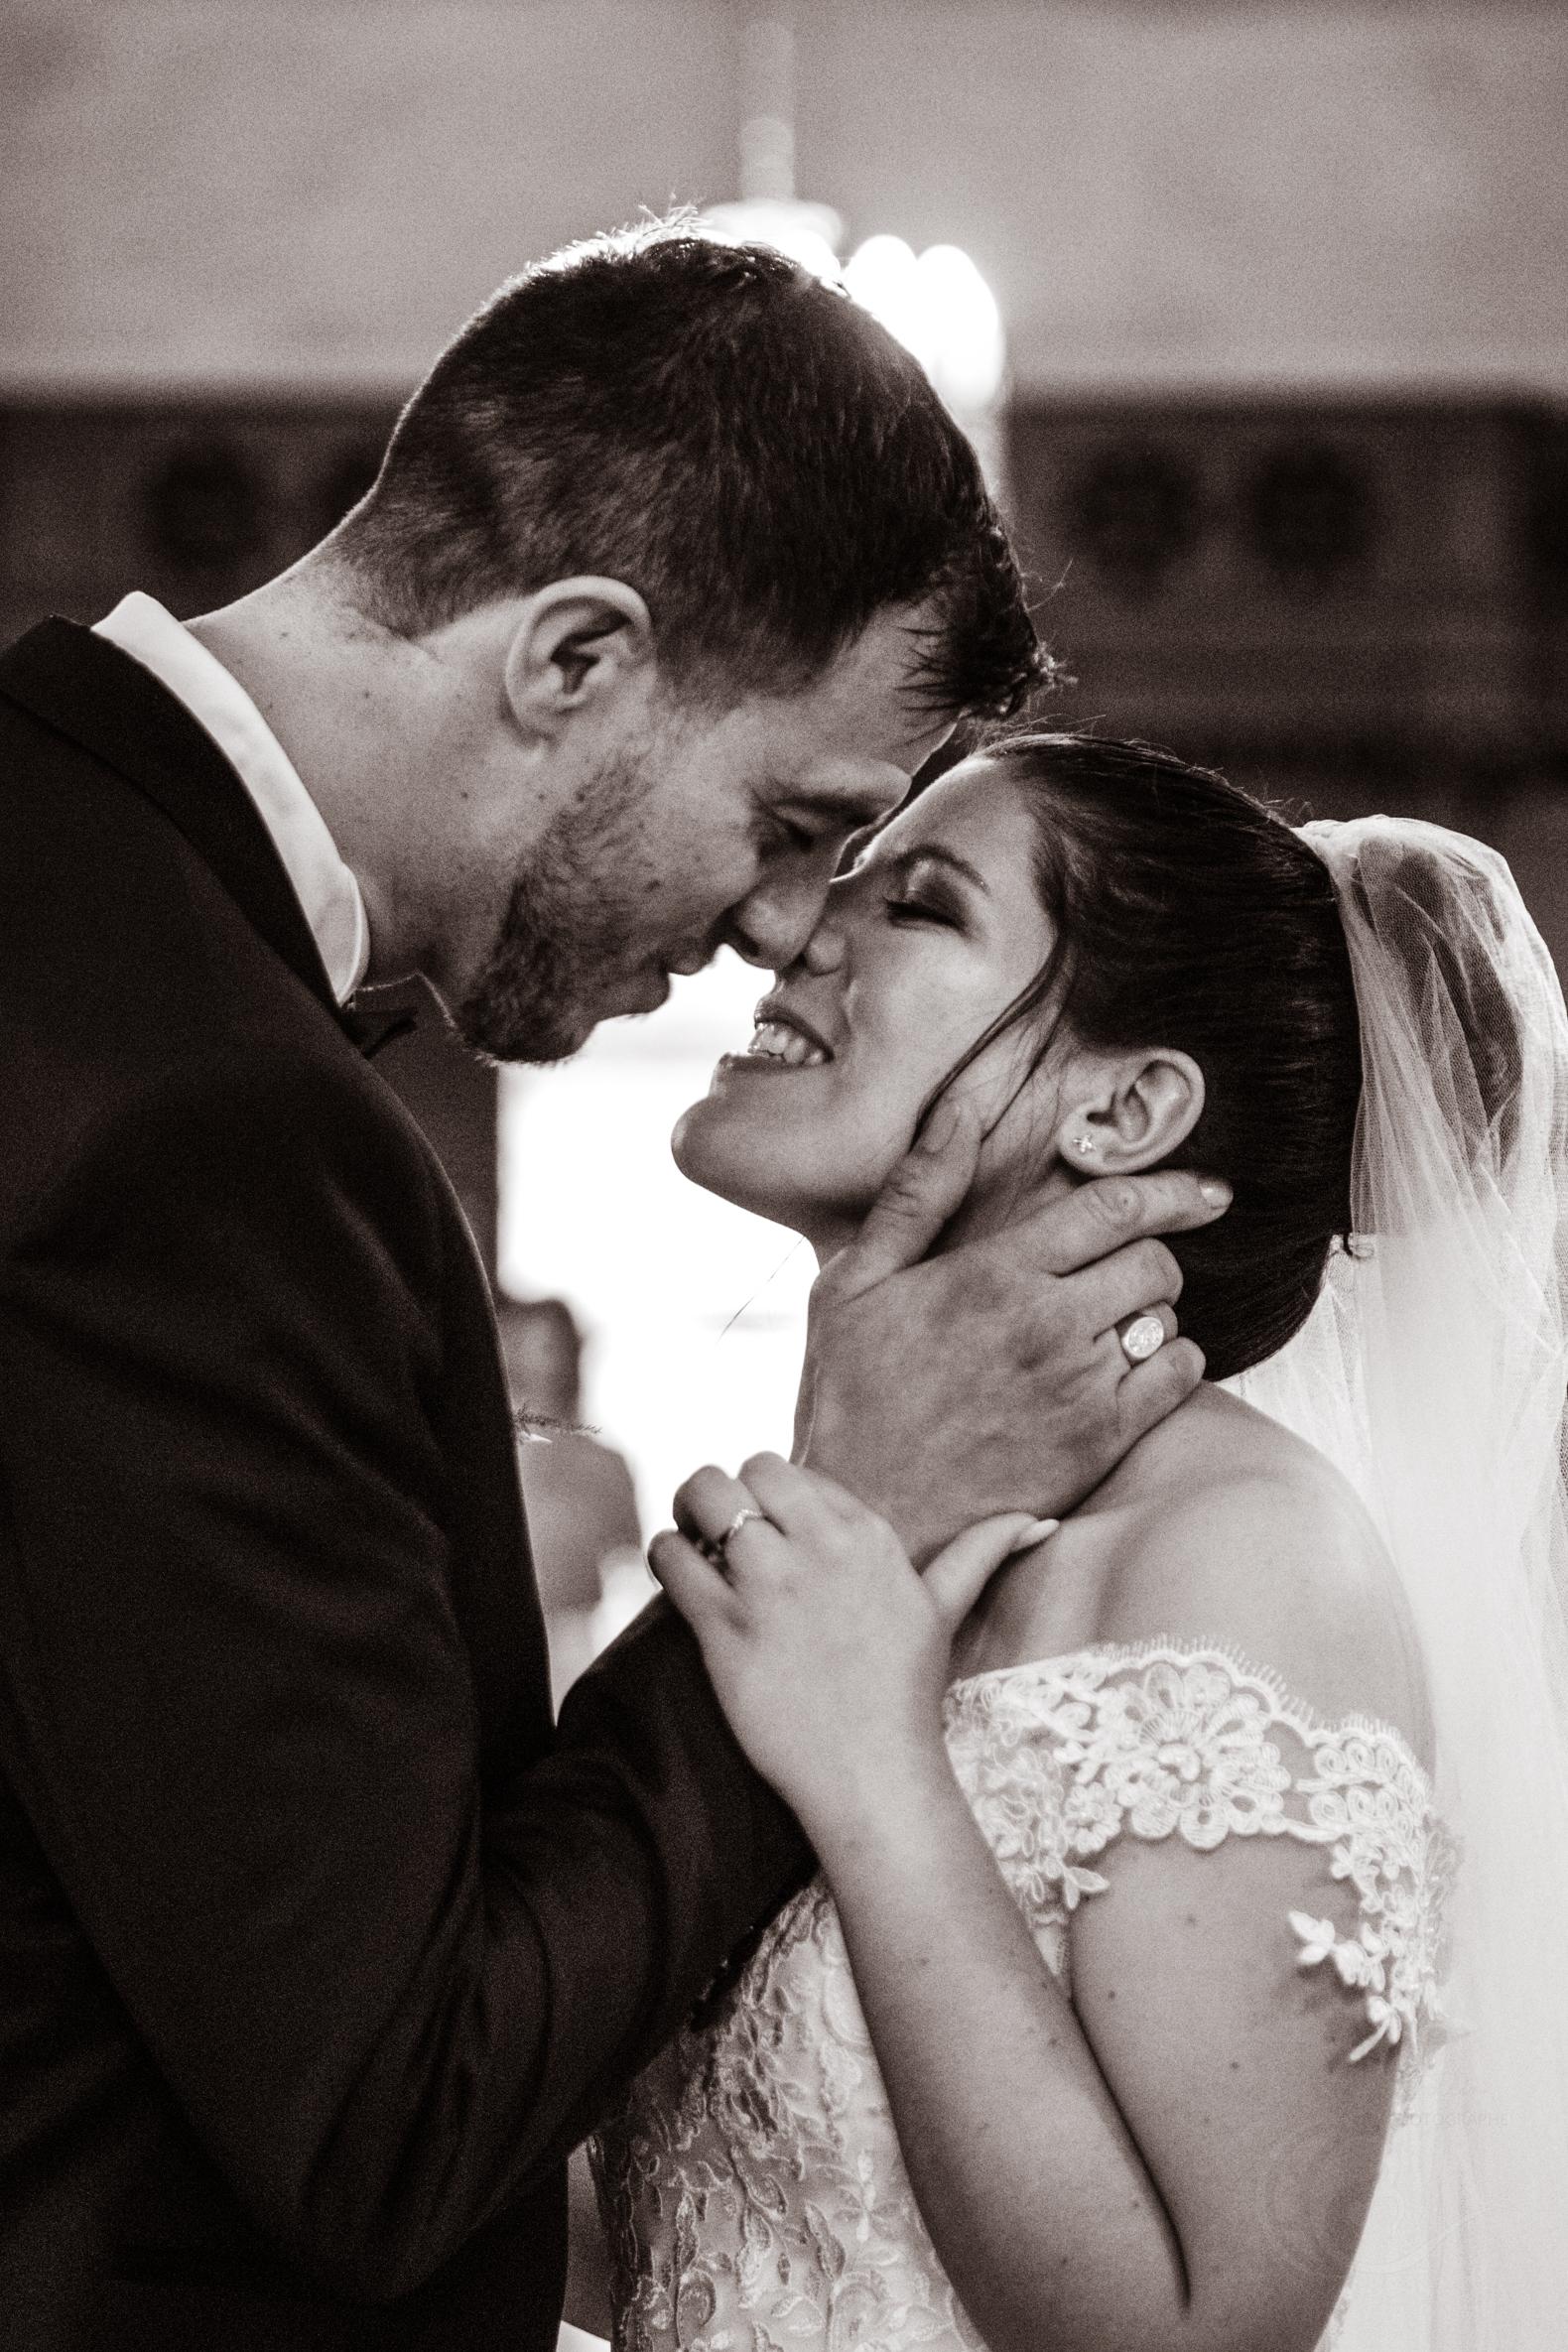 Photographe Mariage en Rhône Alpes proche lyon bourgoin Jallieu Chambery Cremieu